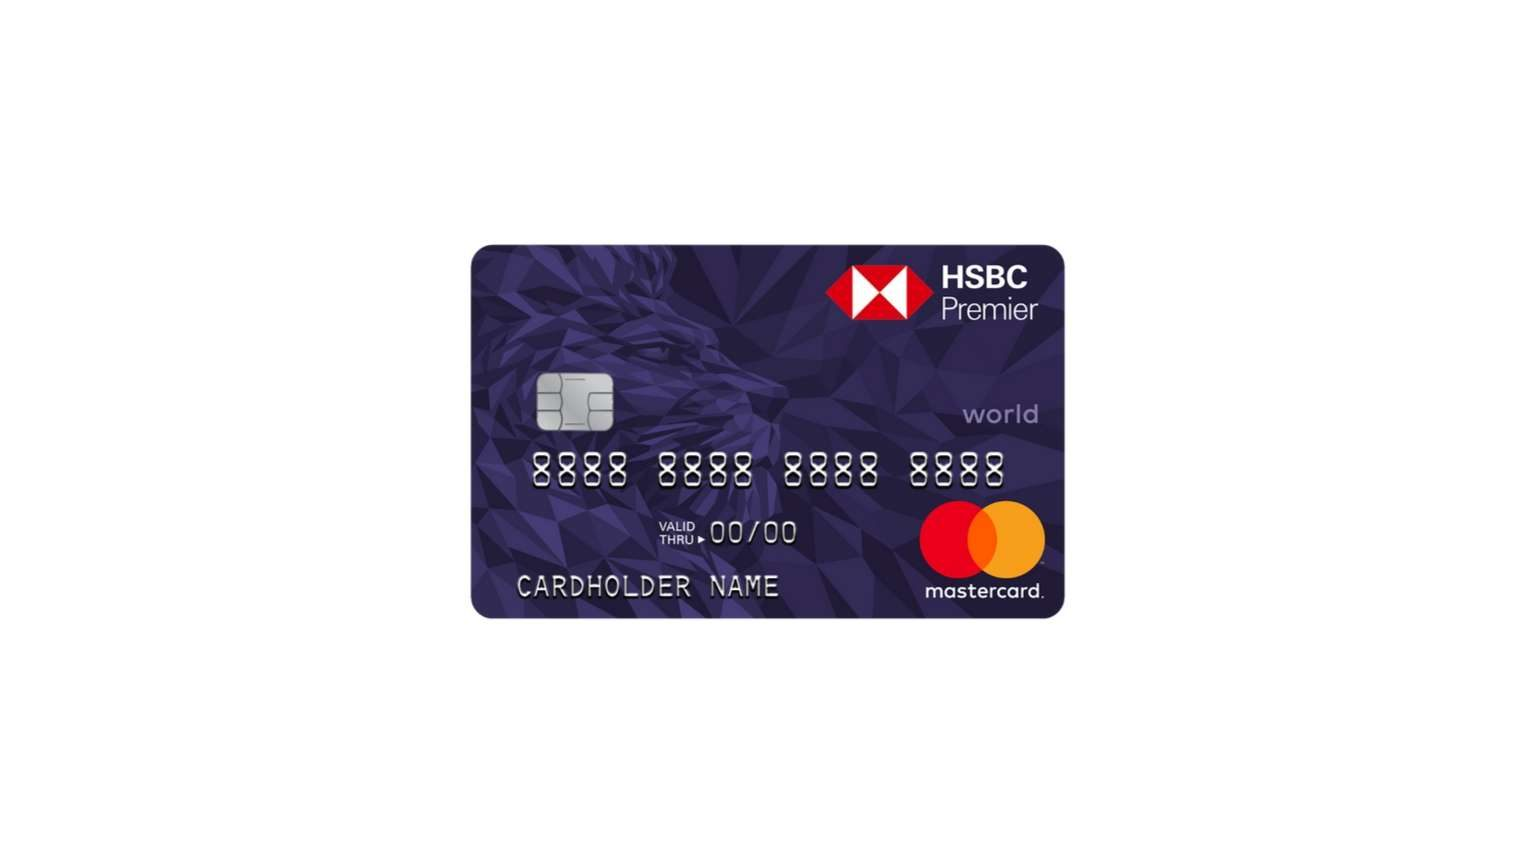 HSBC Premier Mastercard Credit Card